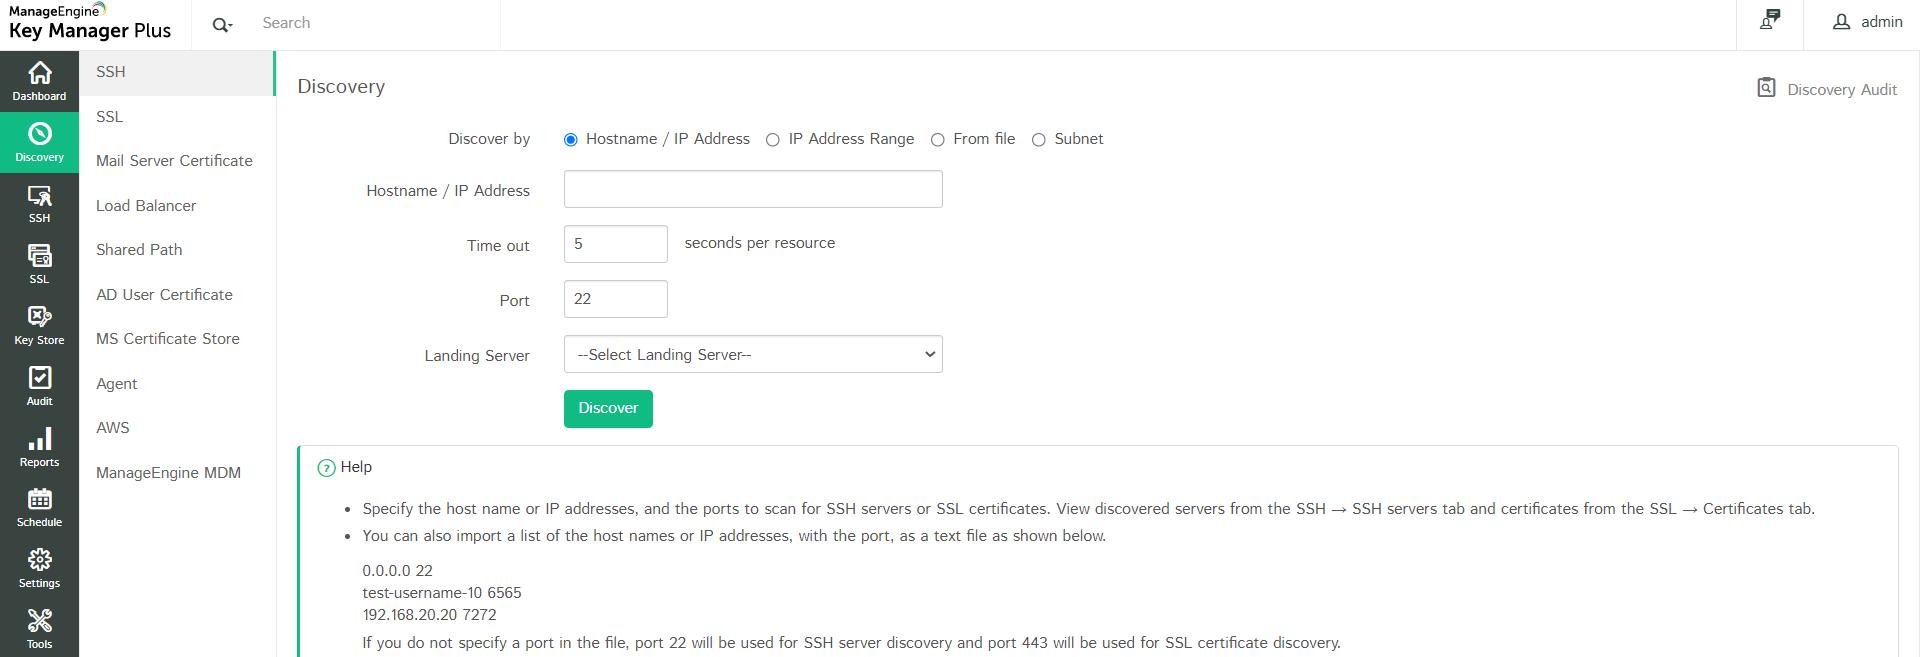 SSH Key Resource Management - Key Manager Plus